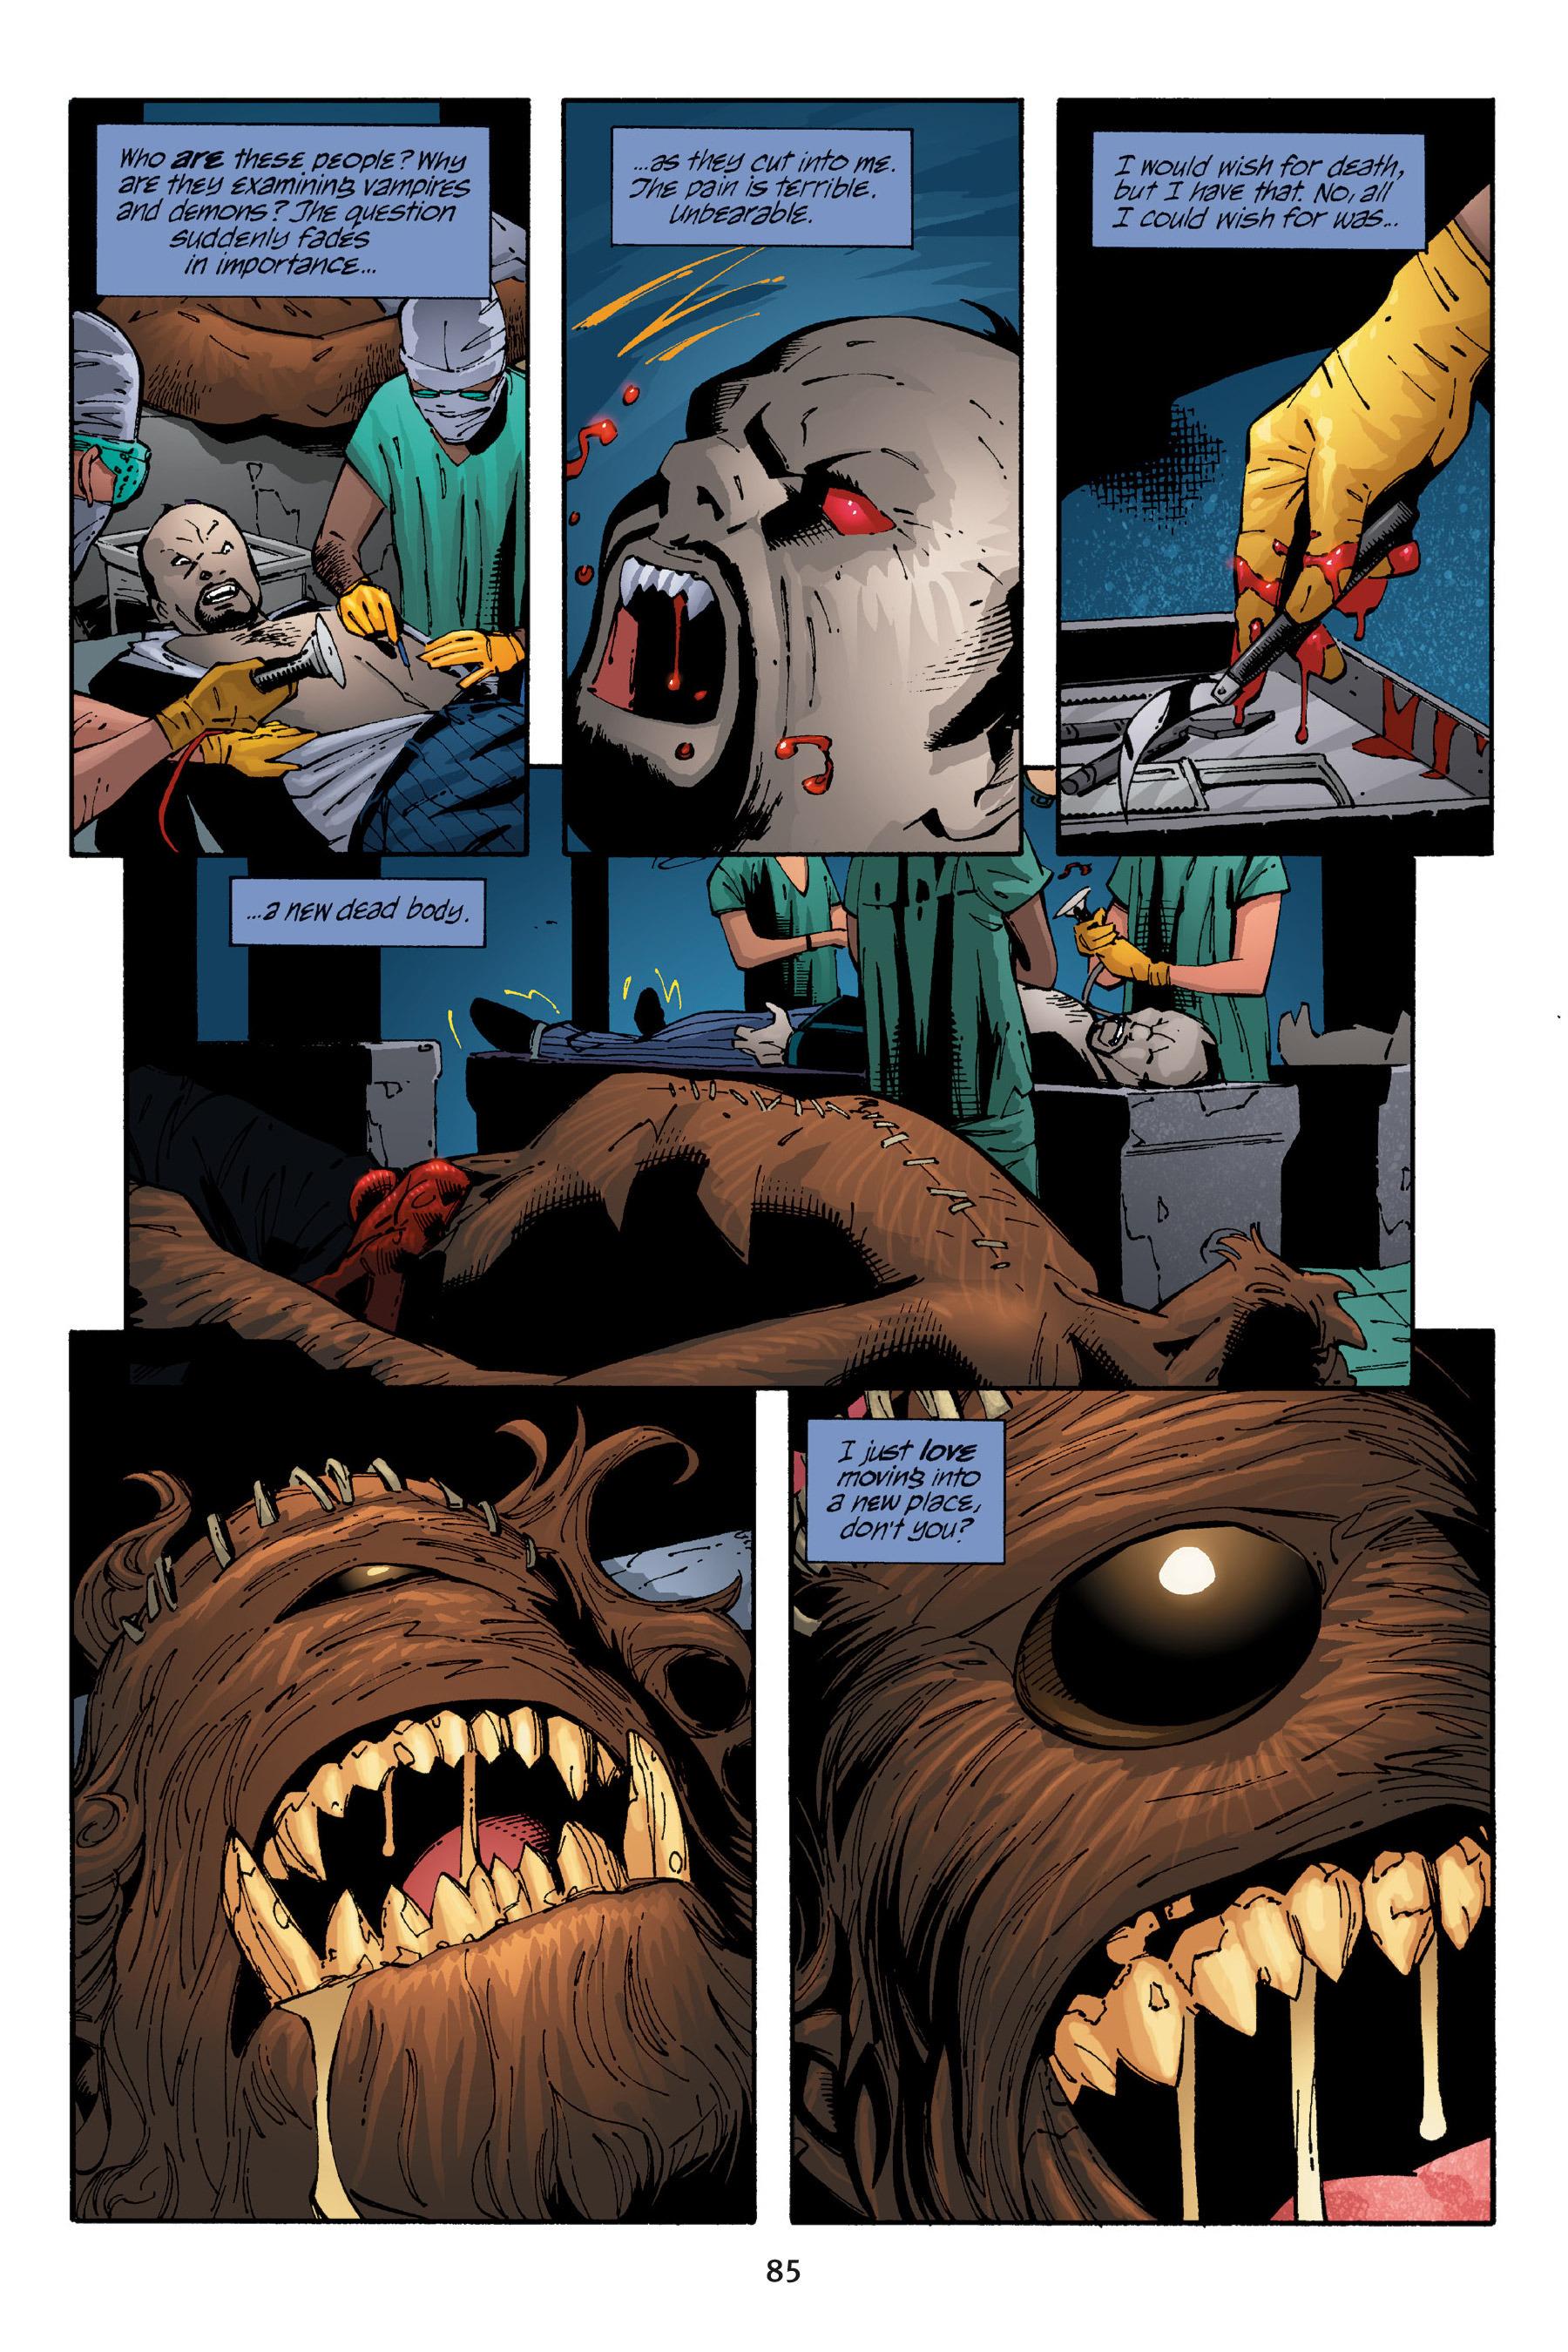 Read online Buffy the Vampire Slayer: Omnibus comic -  Issue # TPB 5 - 86